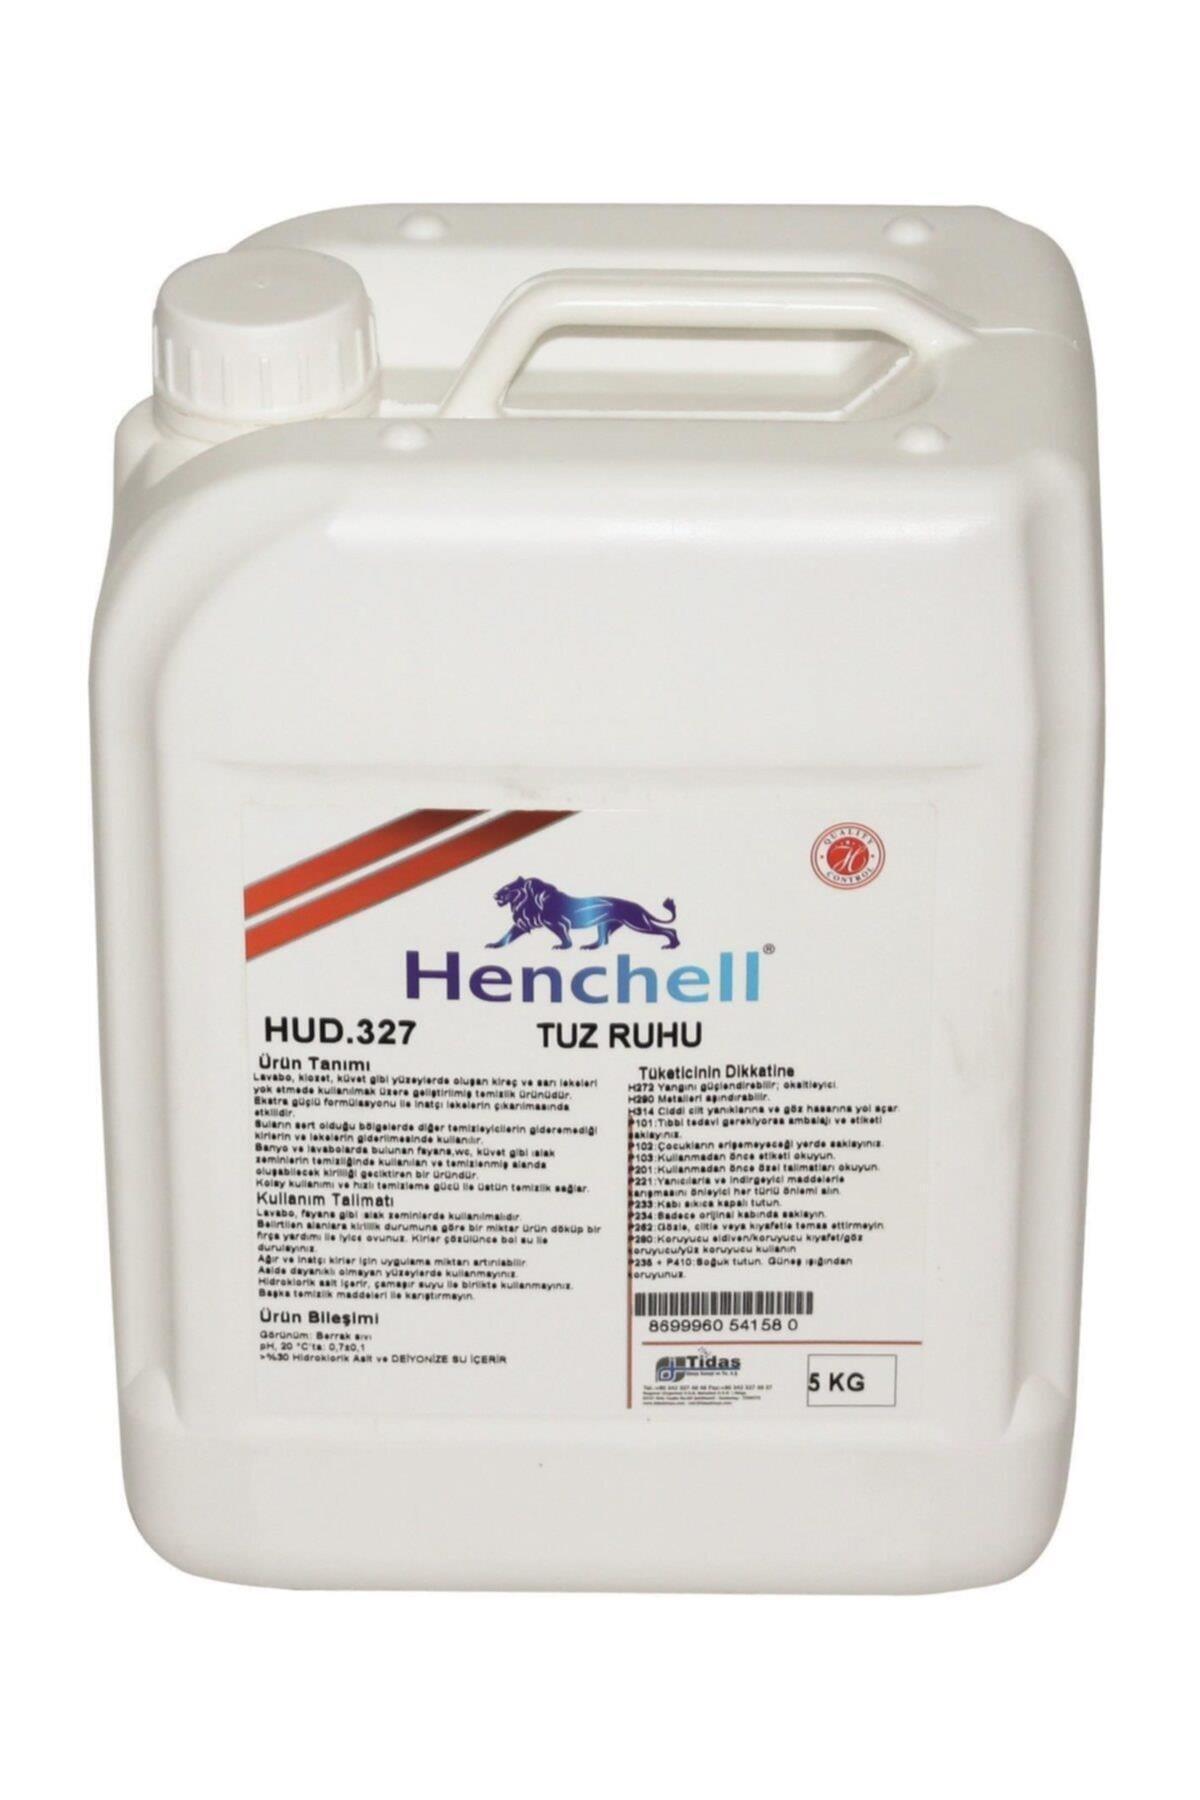 Henchell Tuz Ruhu 5 kg 1